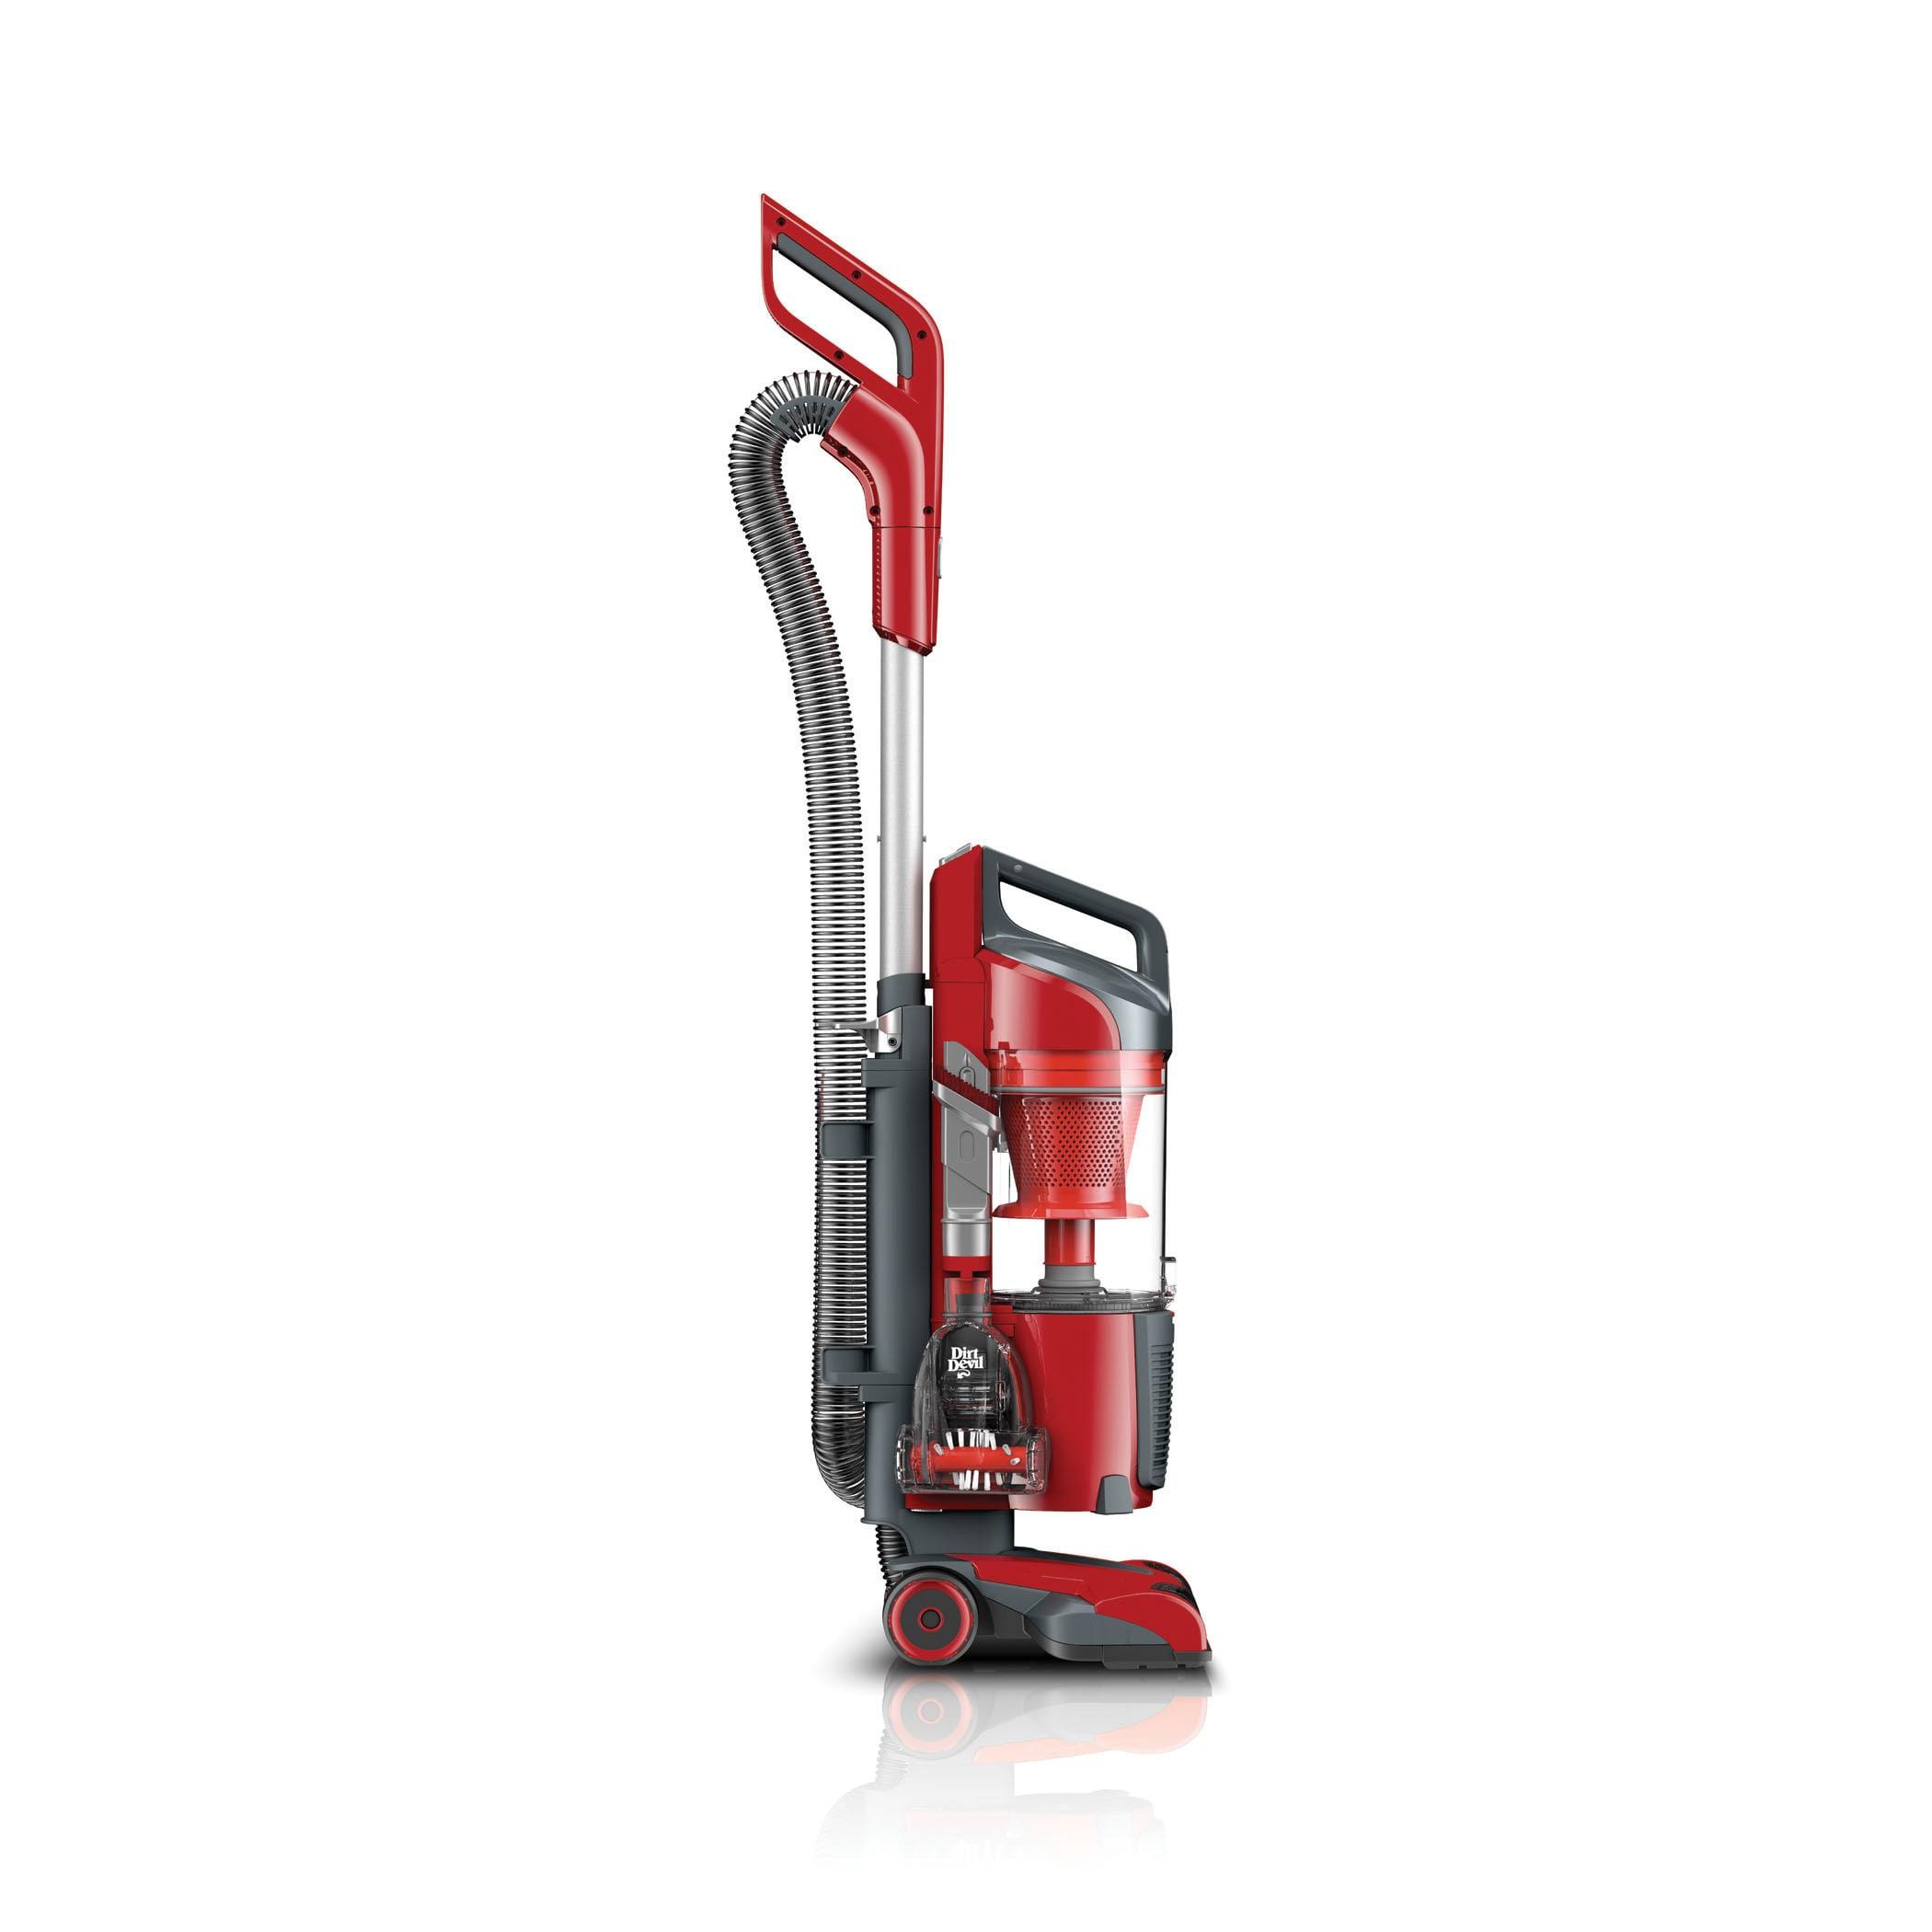 Shop Dirt Devil Ud70300b Lift And Go Upright Vacuum Overstock 12115217